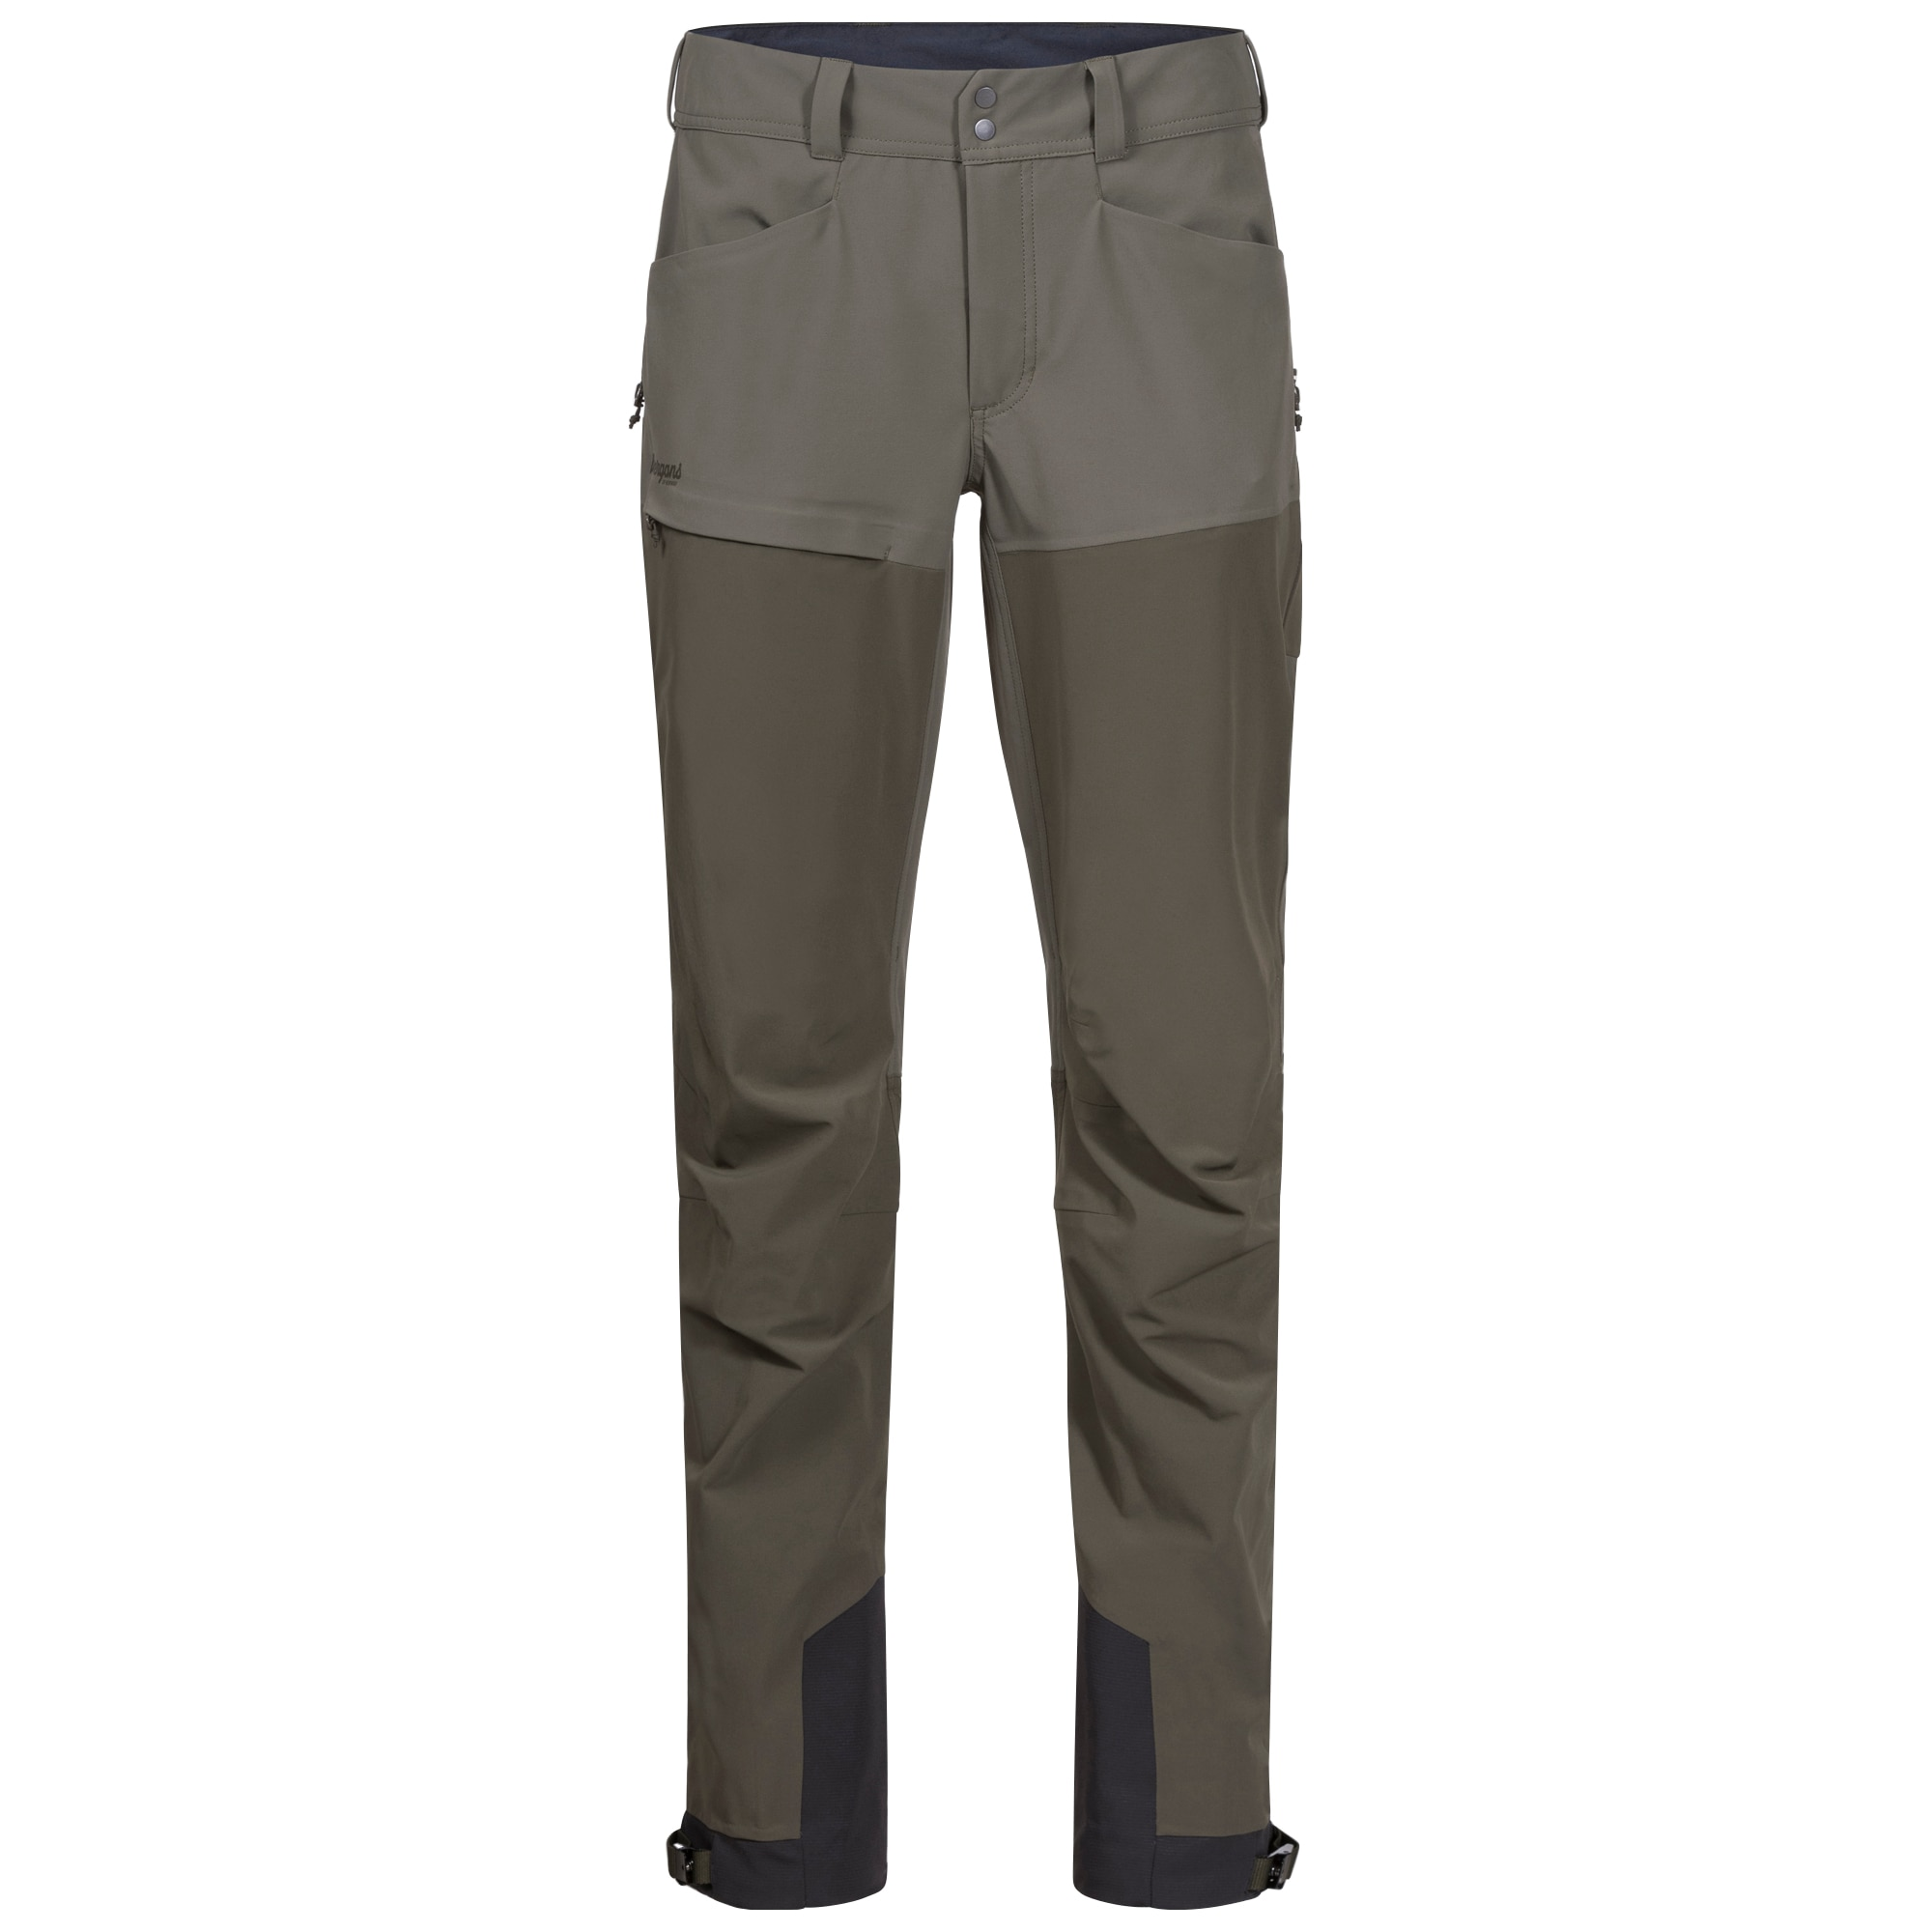 Bekkely Hybrid W Pants